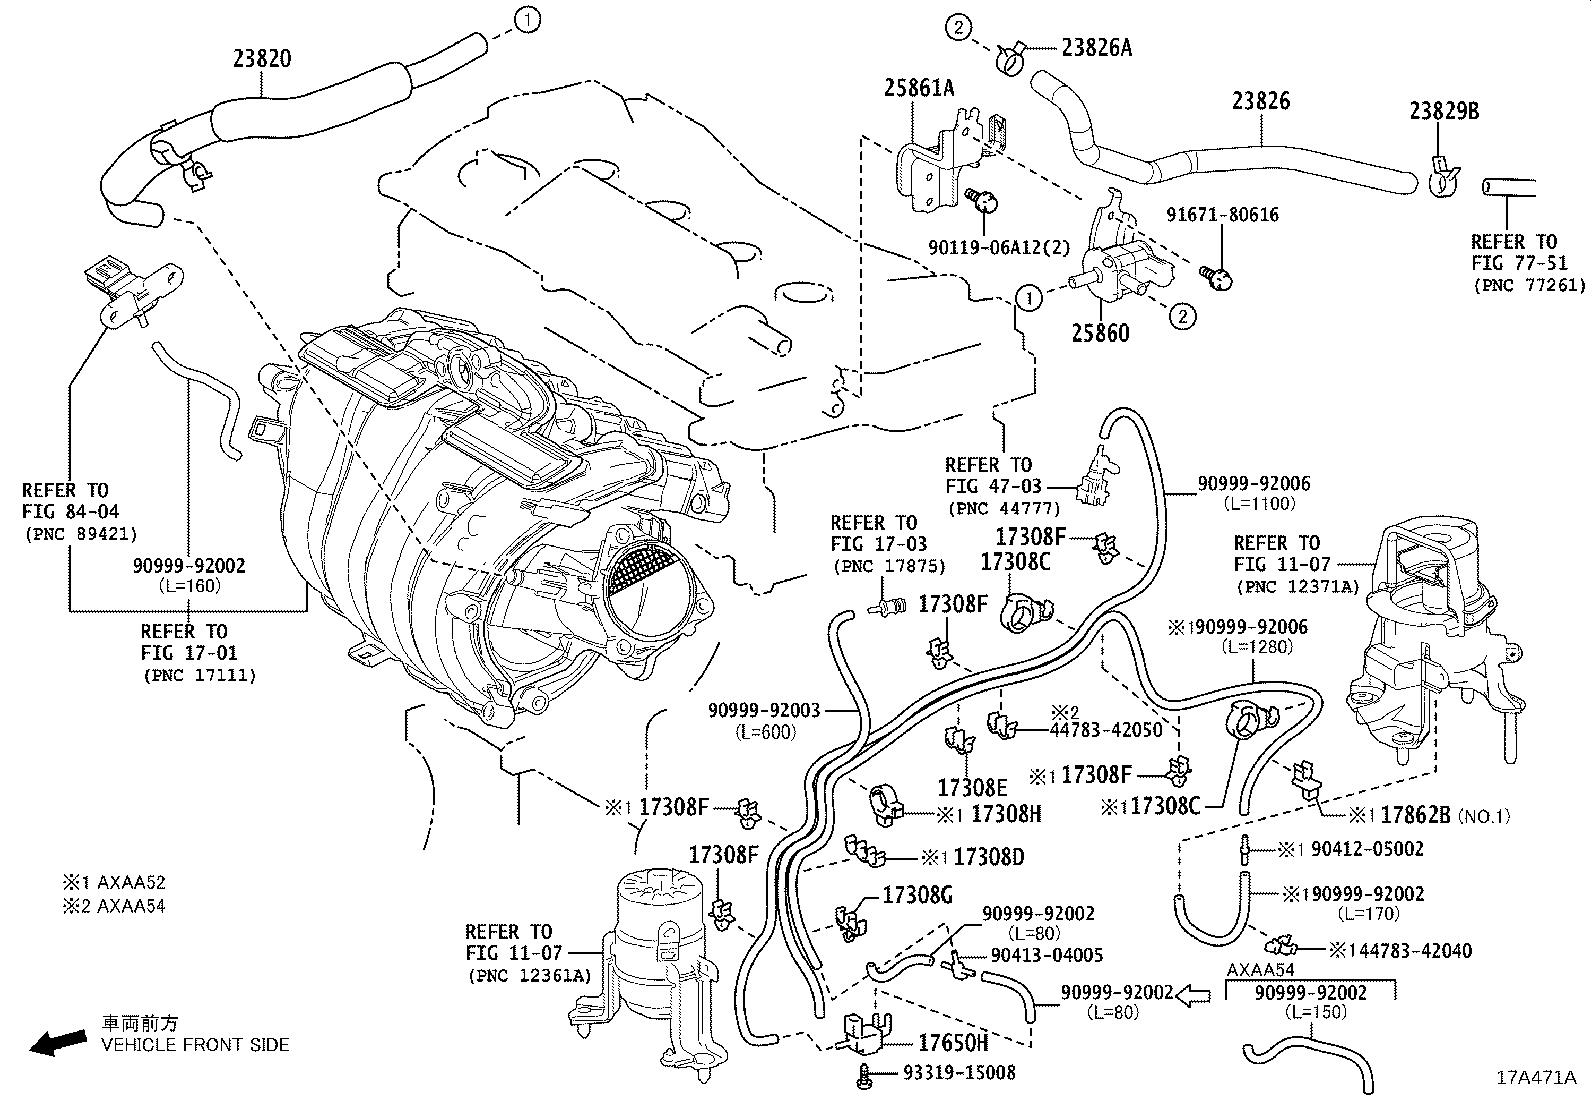 Toyota Rav4 Vapor Canister Purge Solenoid Valve Vacuum